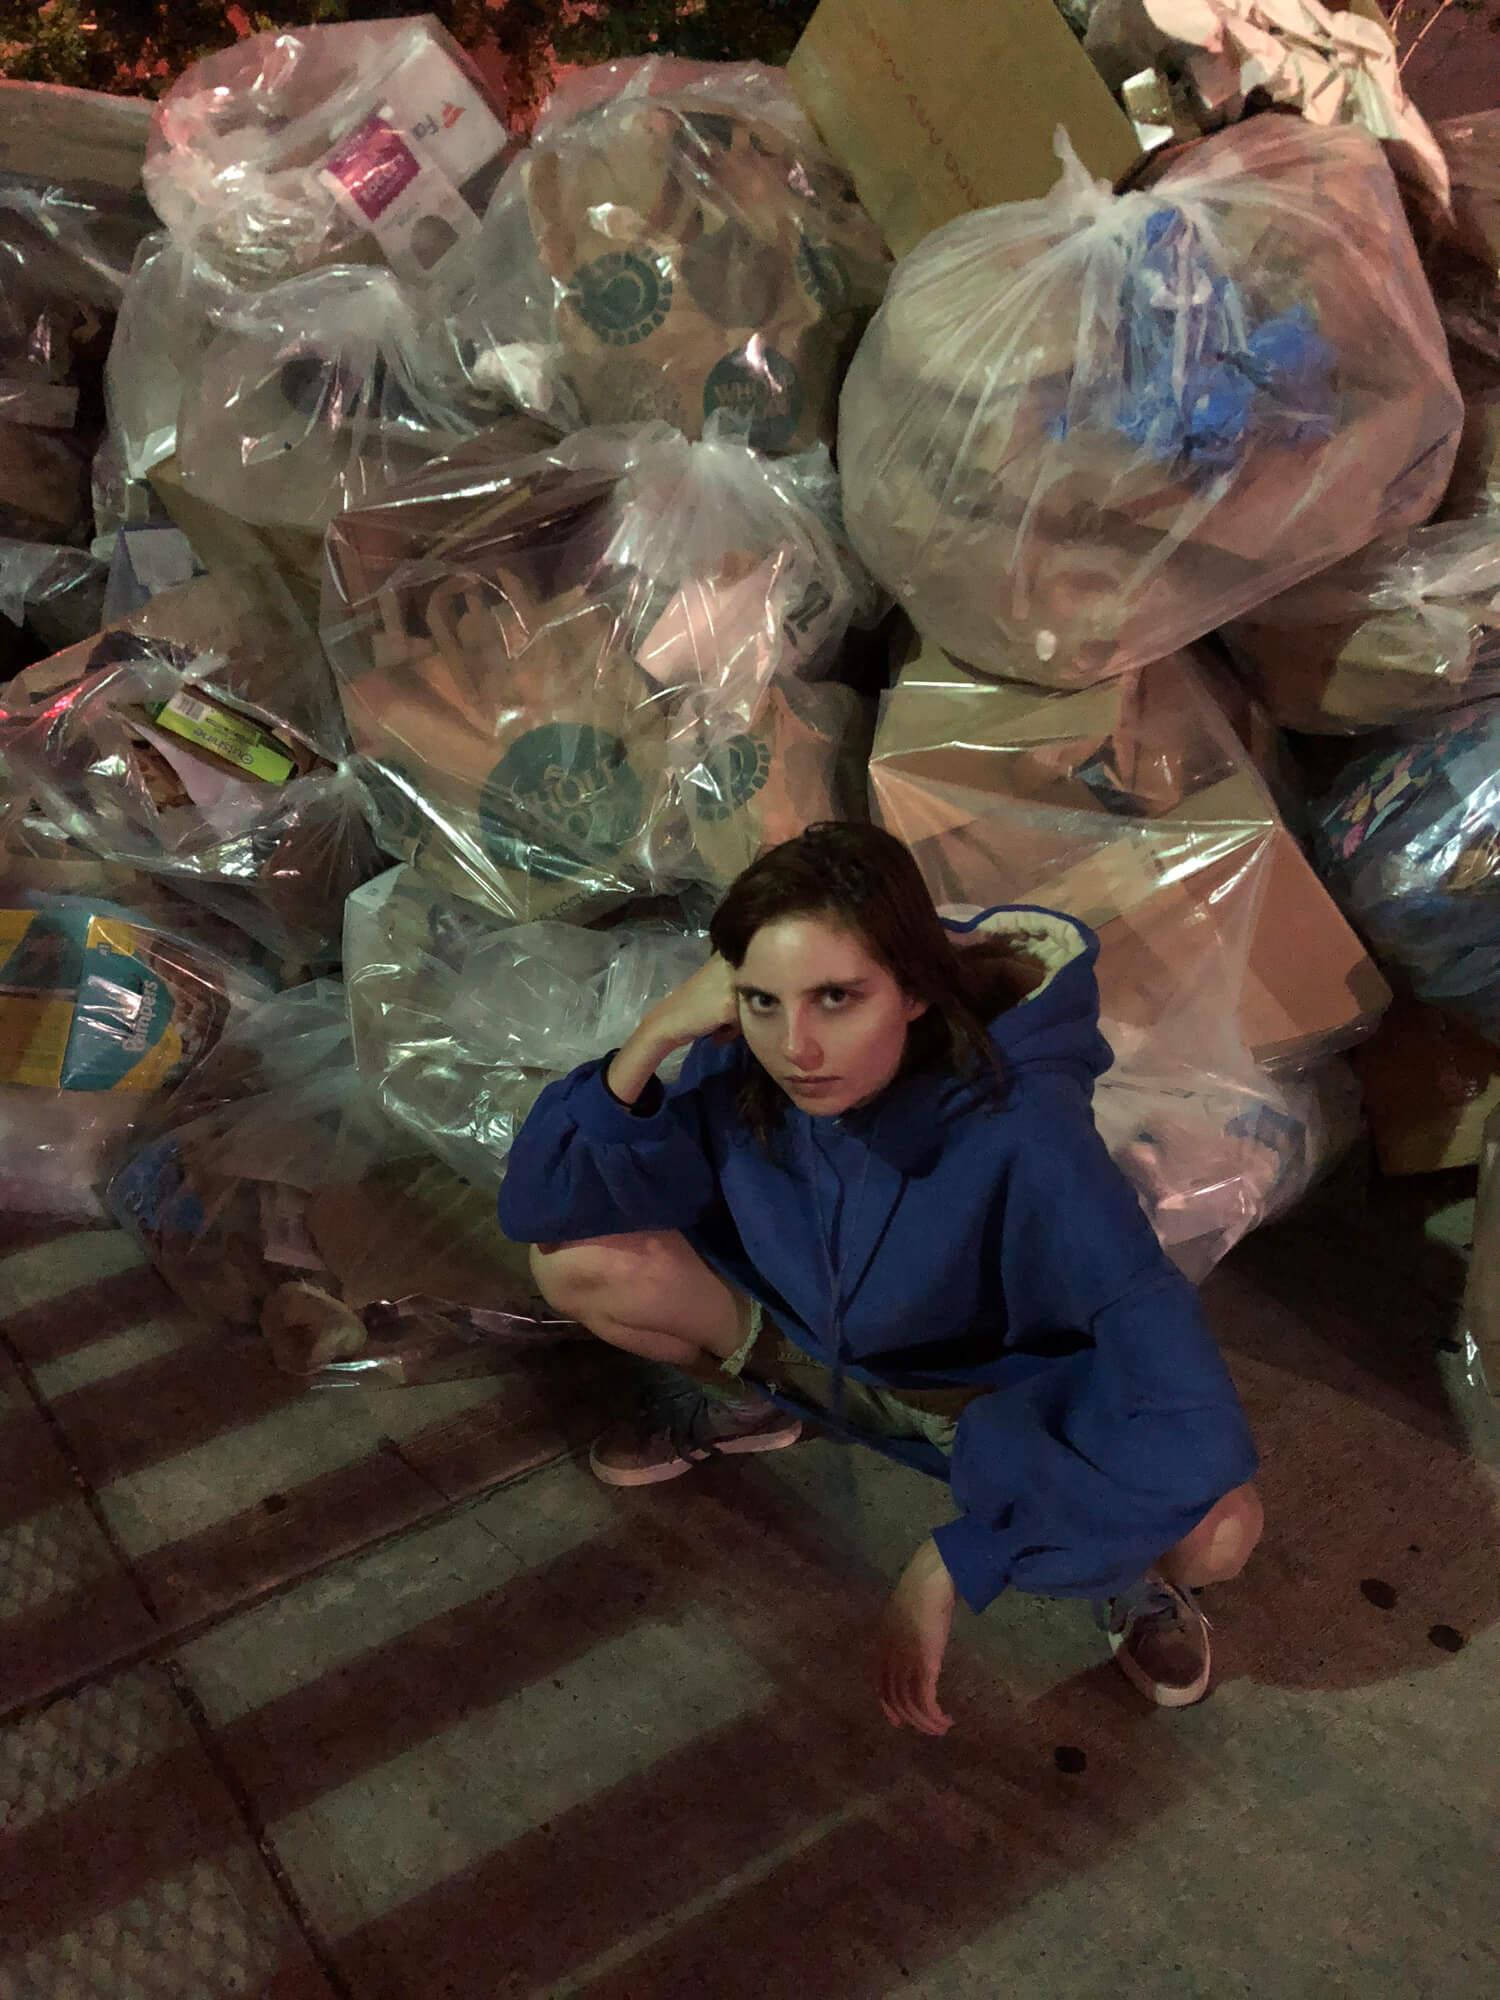 https://liararoux.xxx/wp-content/uploads/2018/10/Liara-Roux-Selfies-and-Snapshots-September-2018-069.jpg